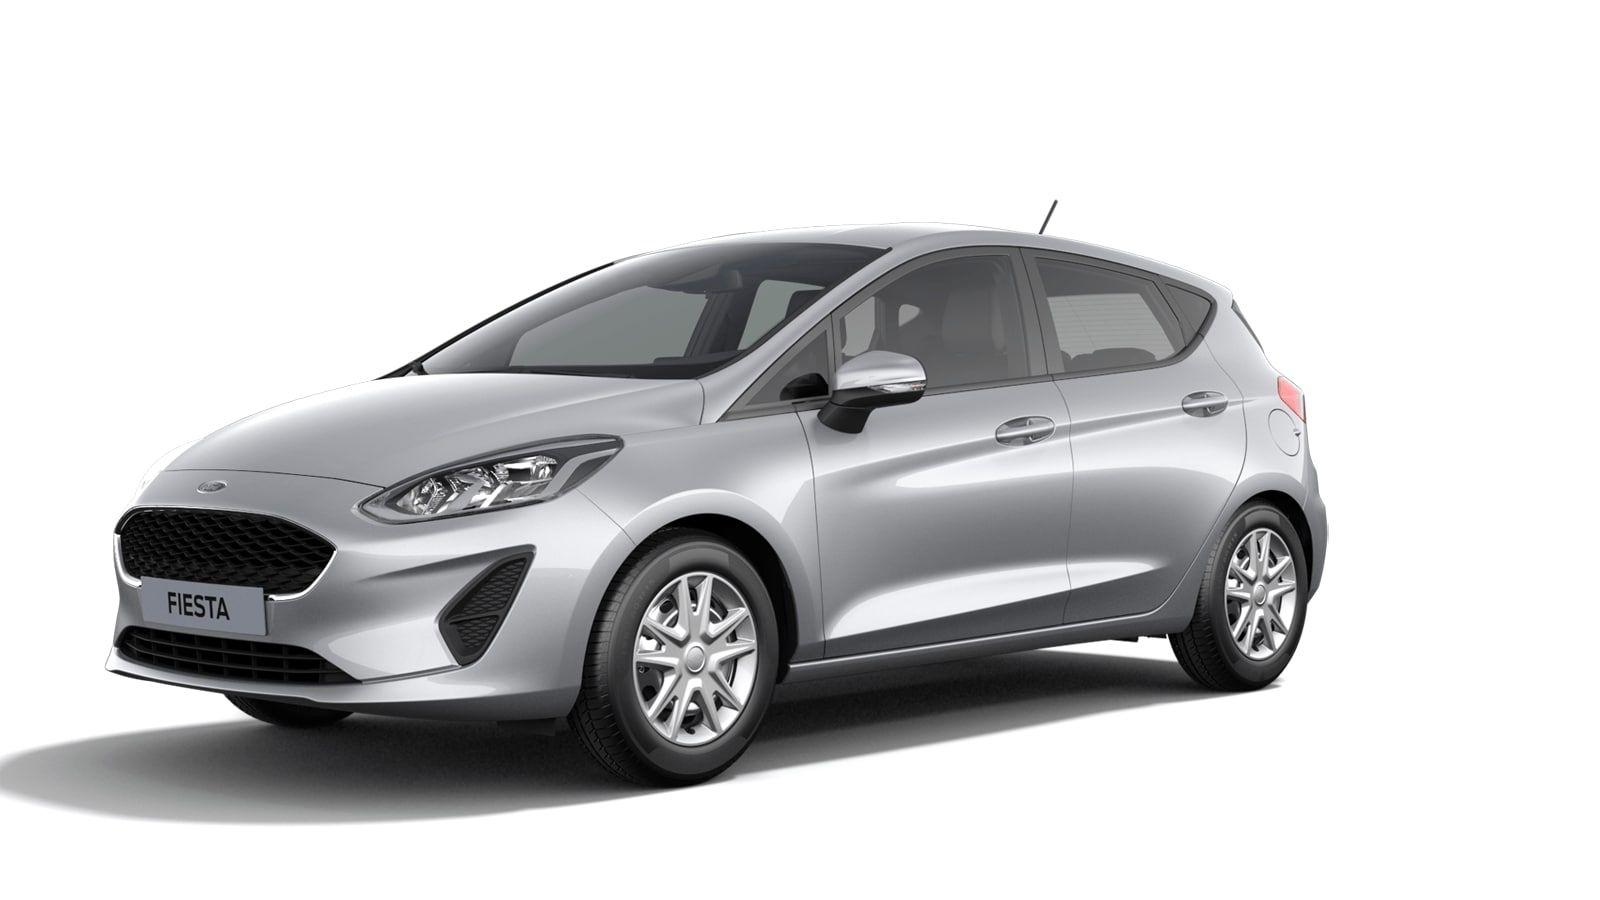 "Nieuw Ford All-new ford fiesta Connected 1.0i EcoBoost 95pk / 70kW M6 - 5d JK6 - Metaalkleur ""Moondust Silver"" 1"